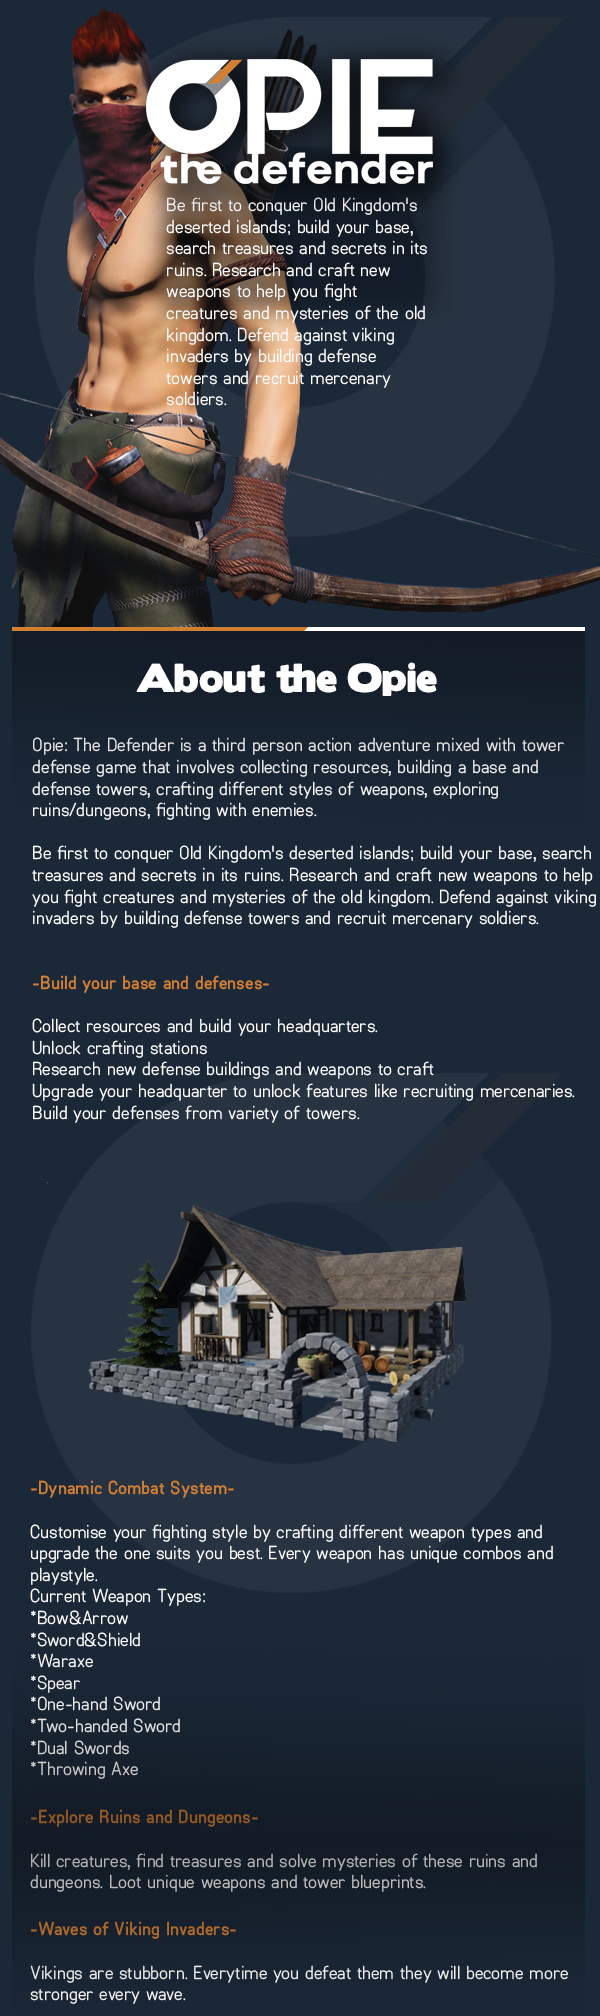 Opie: The Defender on Steam